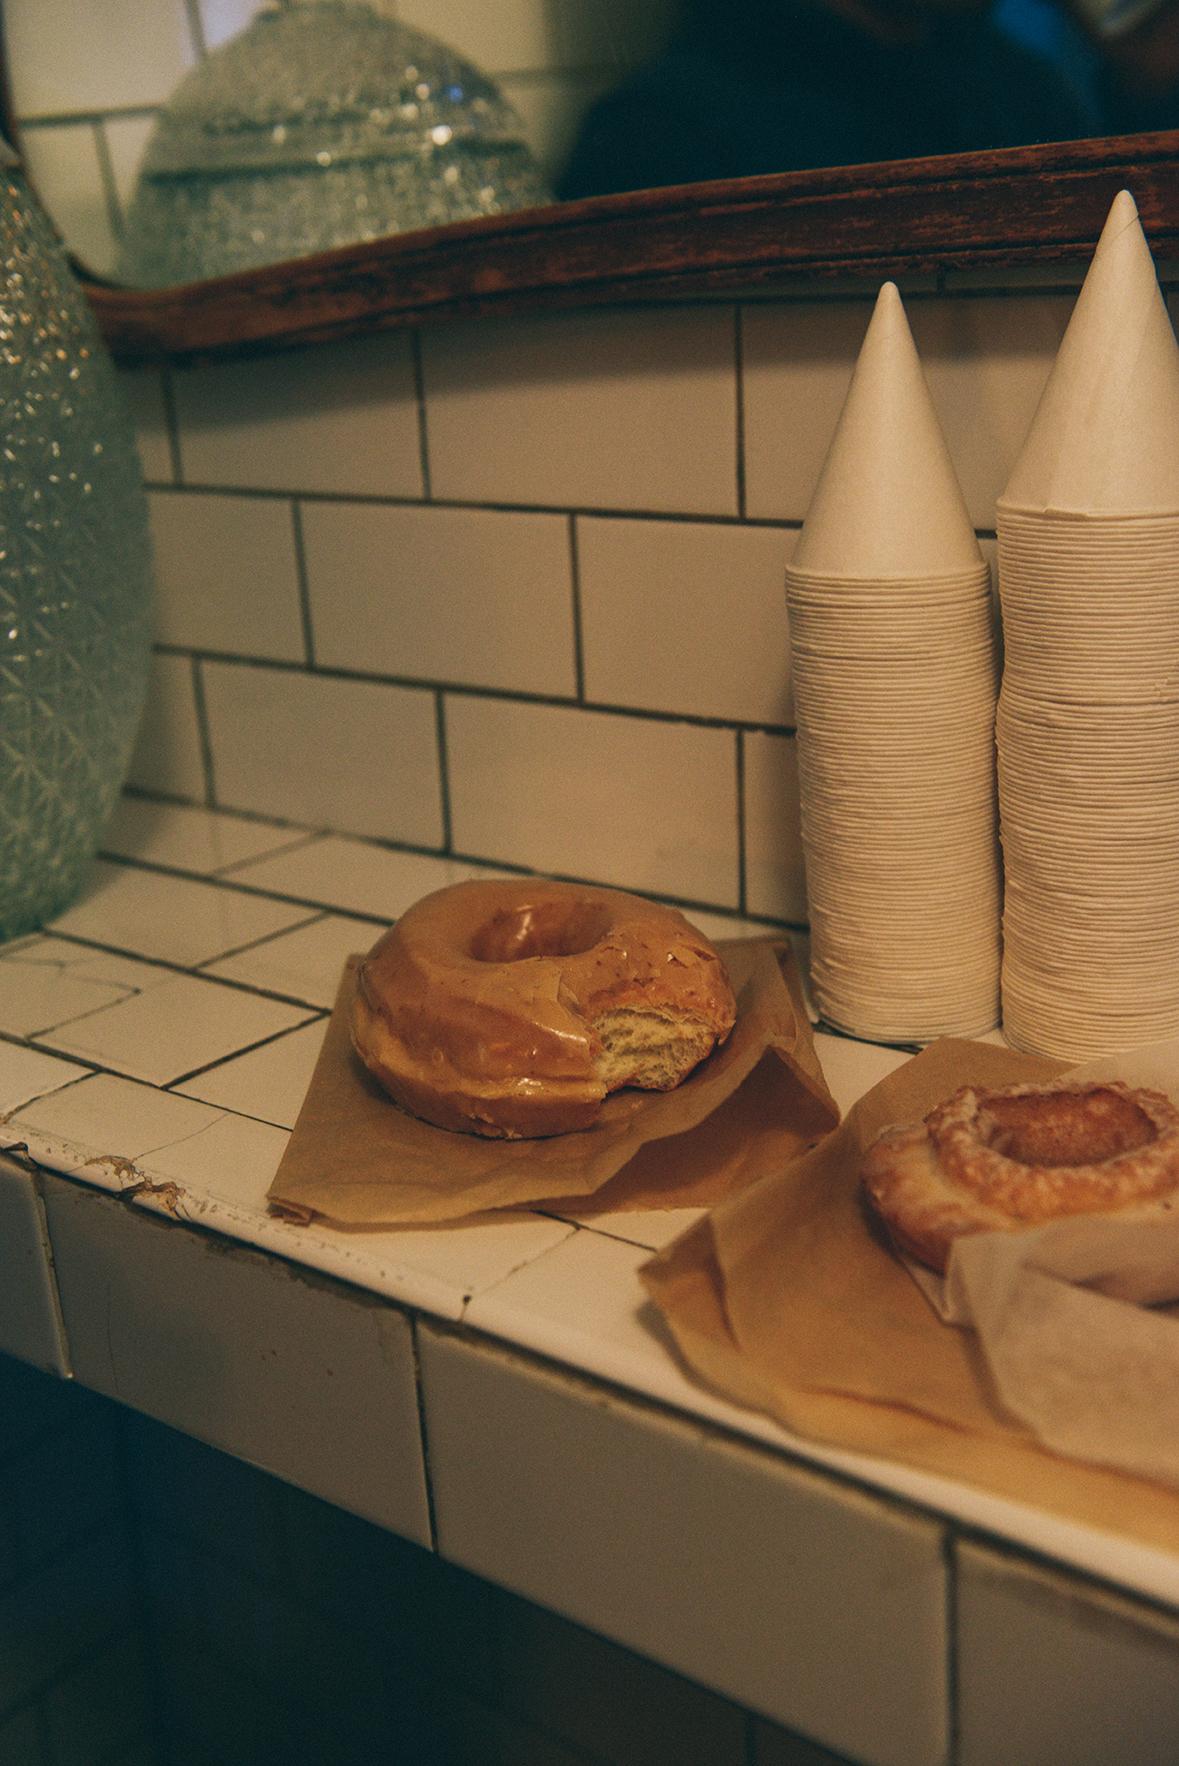 Westward Wanderings: Coffee & Doughnuts in Chicago